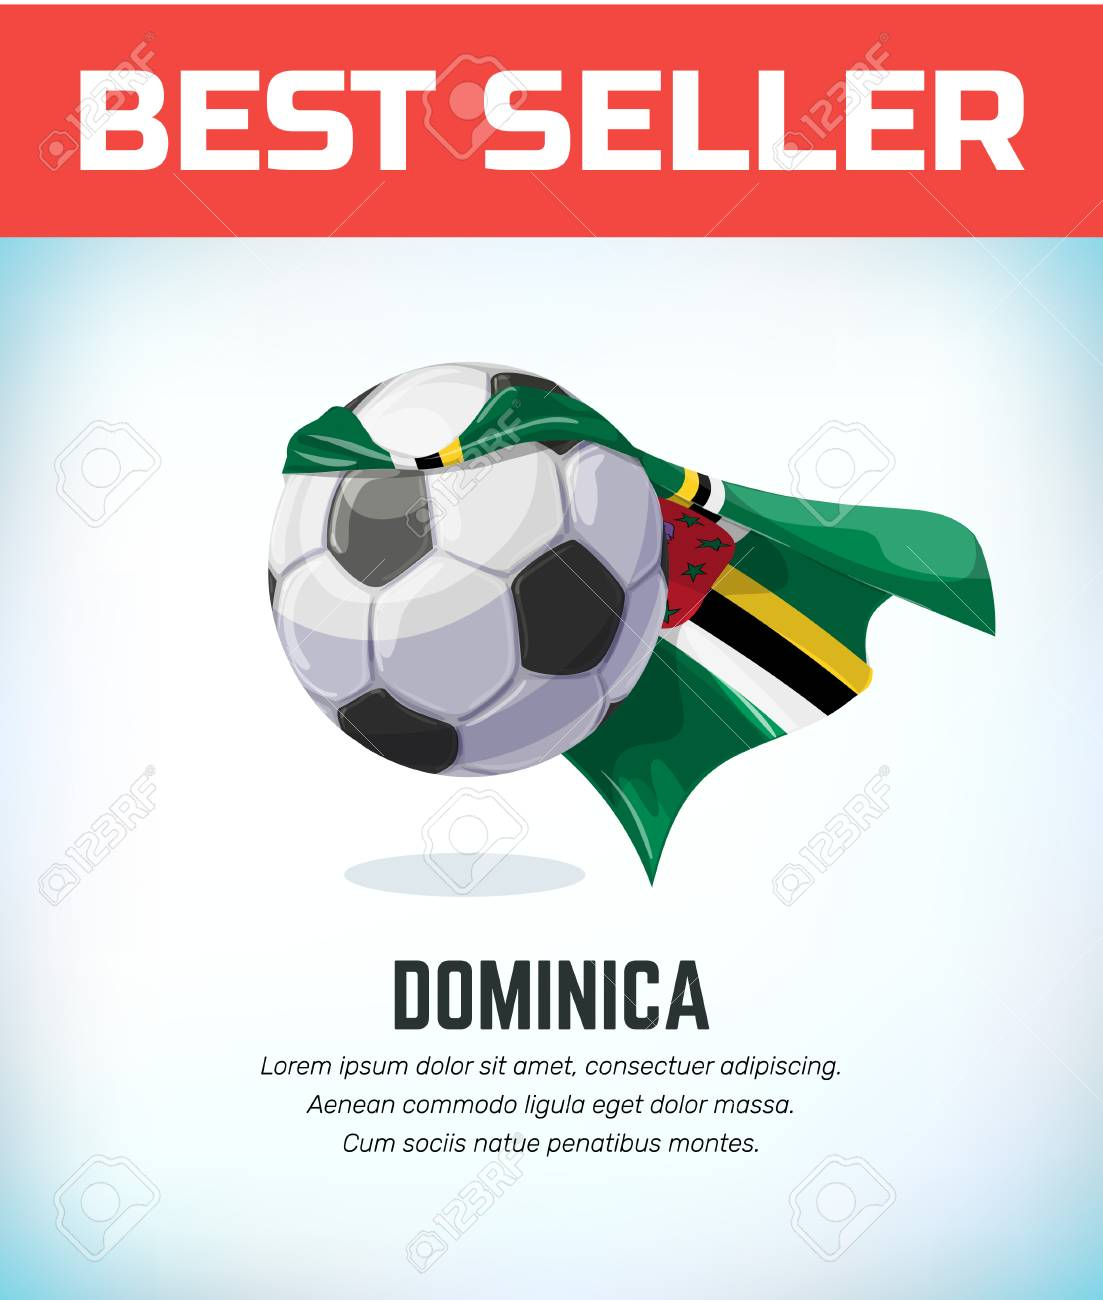 Domina football or soccer ball. Football national team. Vector illustration. - 118795720